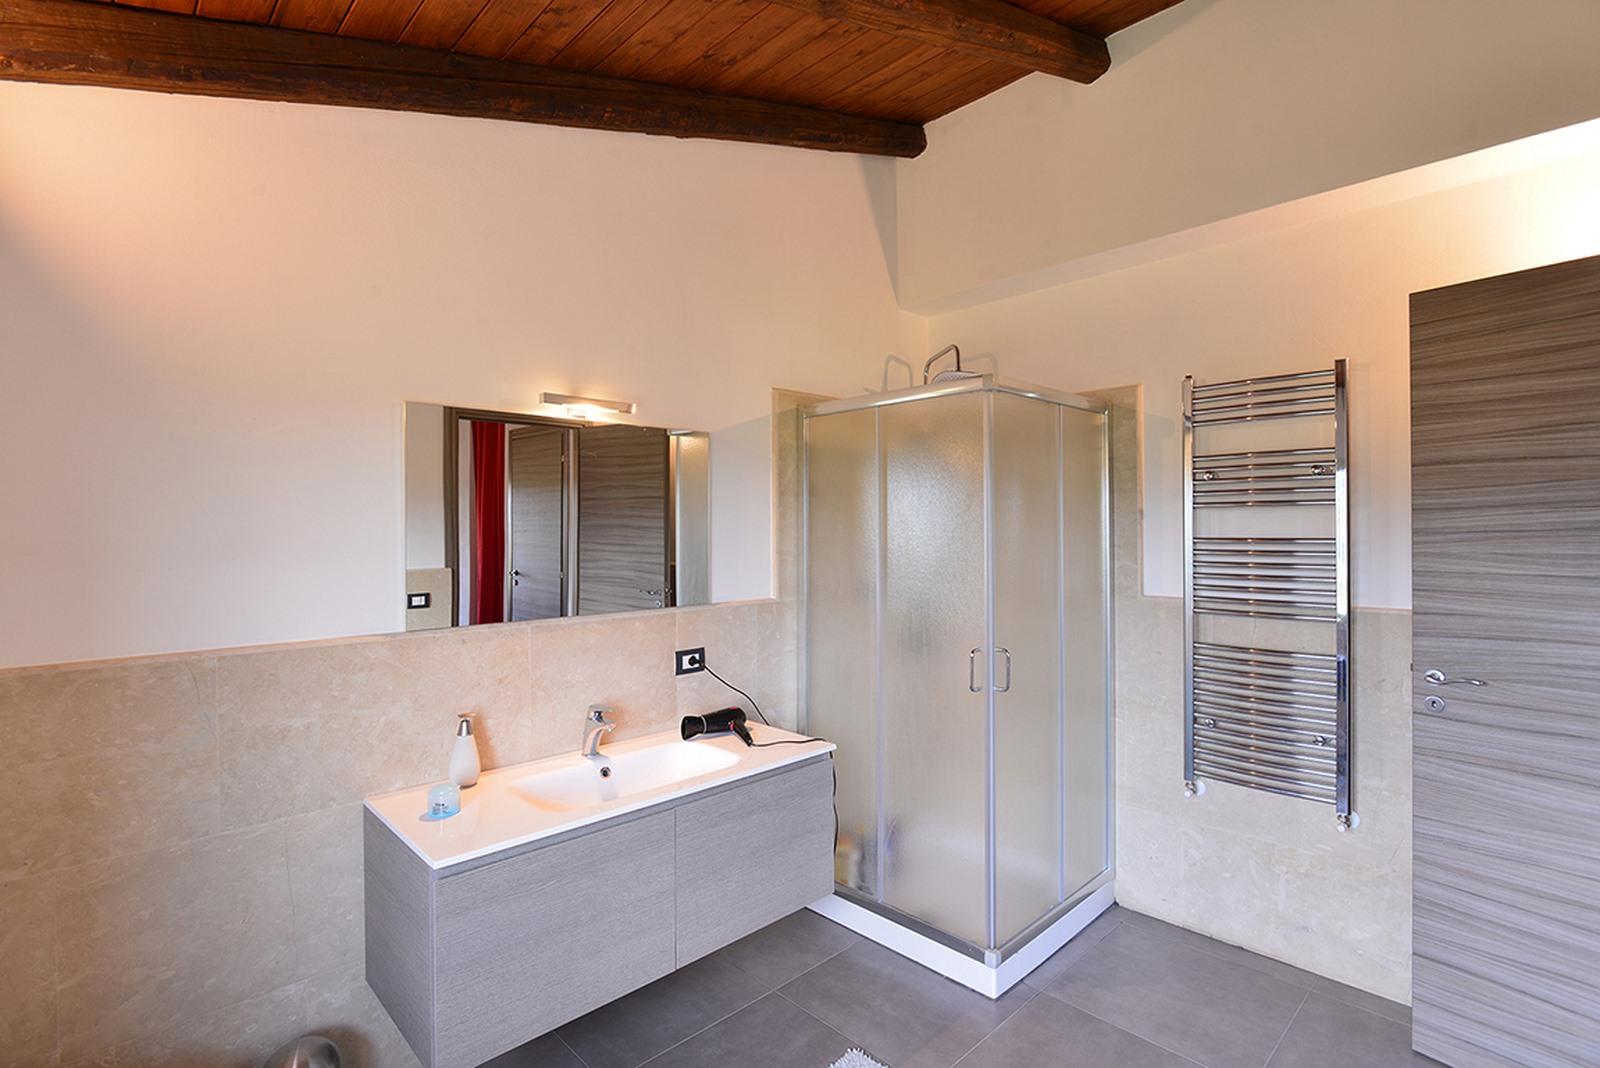 Maison de vacances Villa Monasteri (1606039), Floridia, Siracusa, Sicile, Italie, image 18